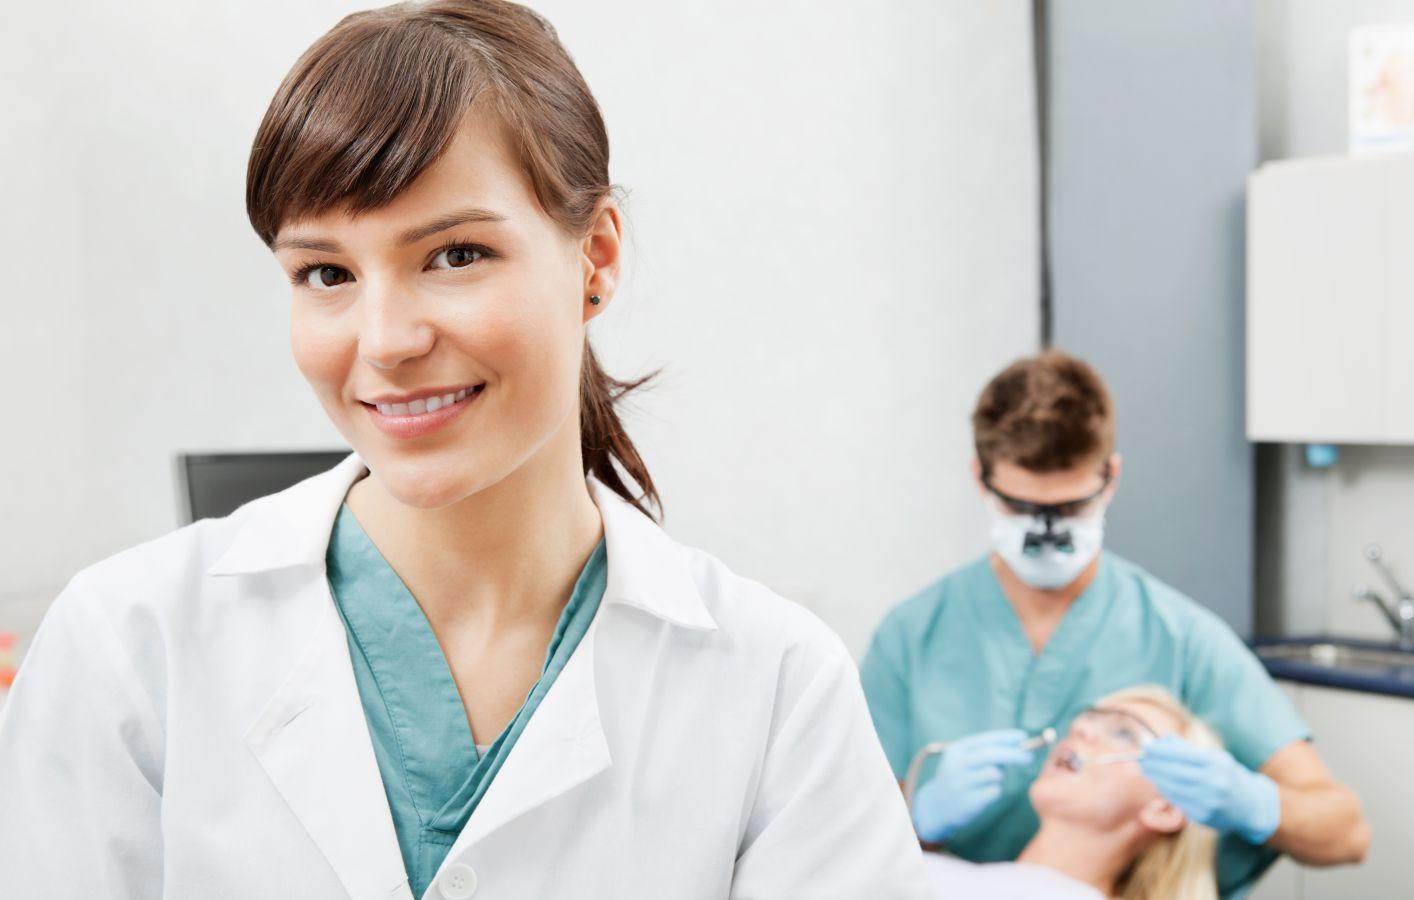 A dental therapist working on dental implants in Honolulu, HI